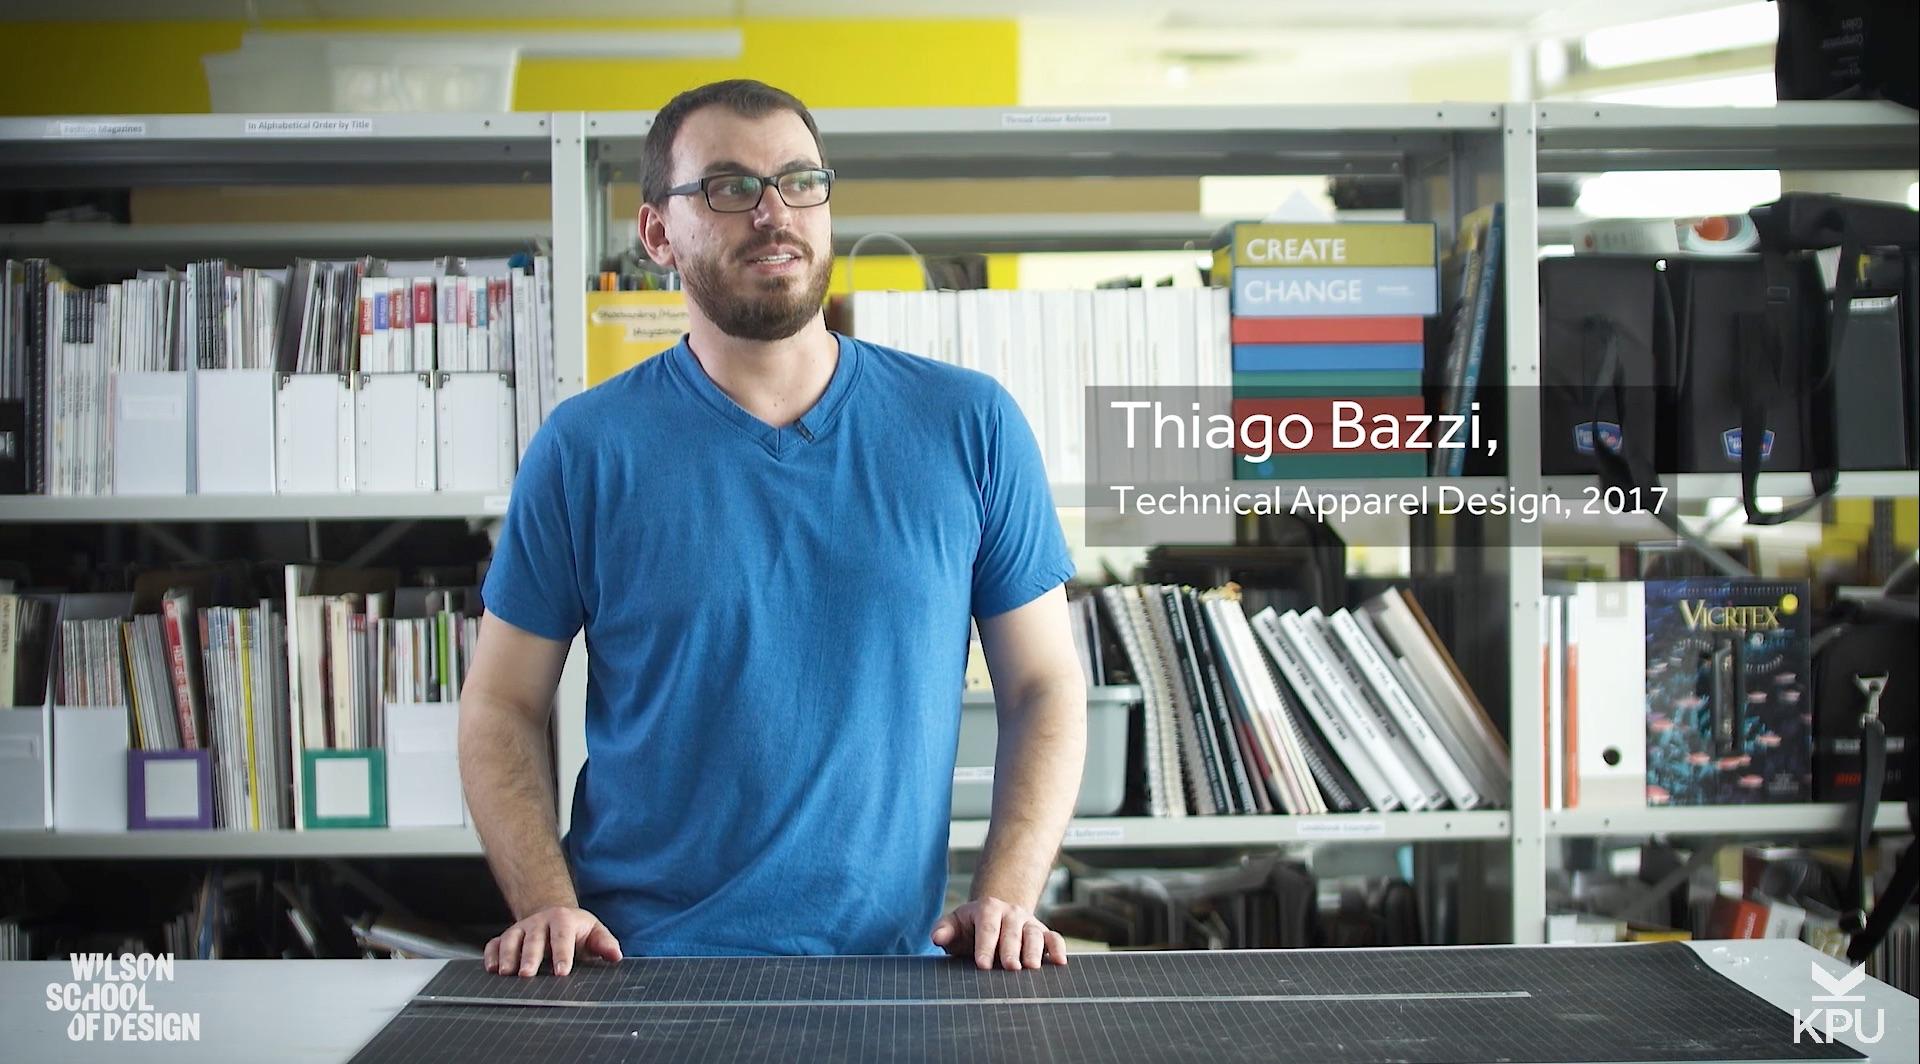 Thiago Bazzi